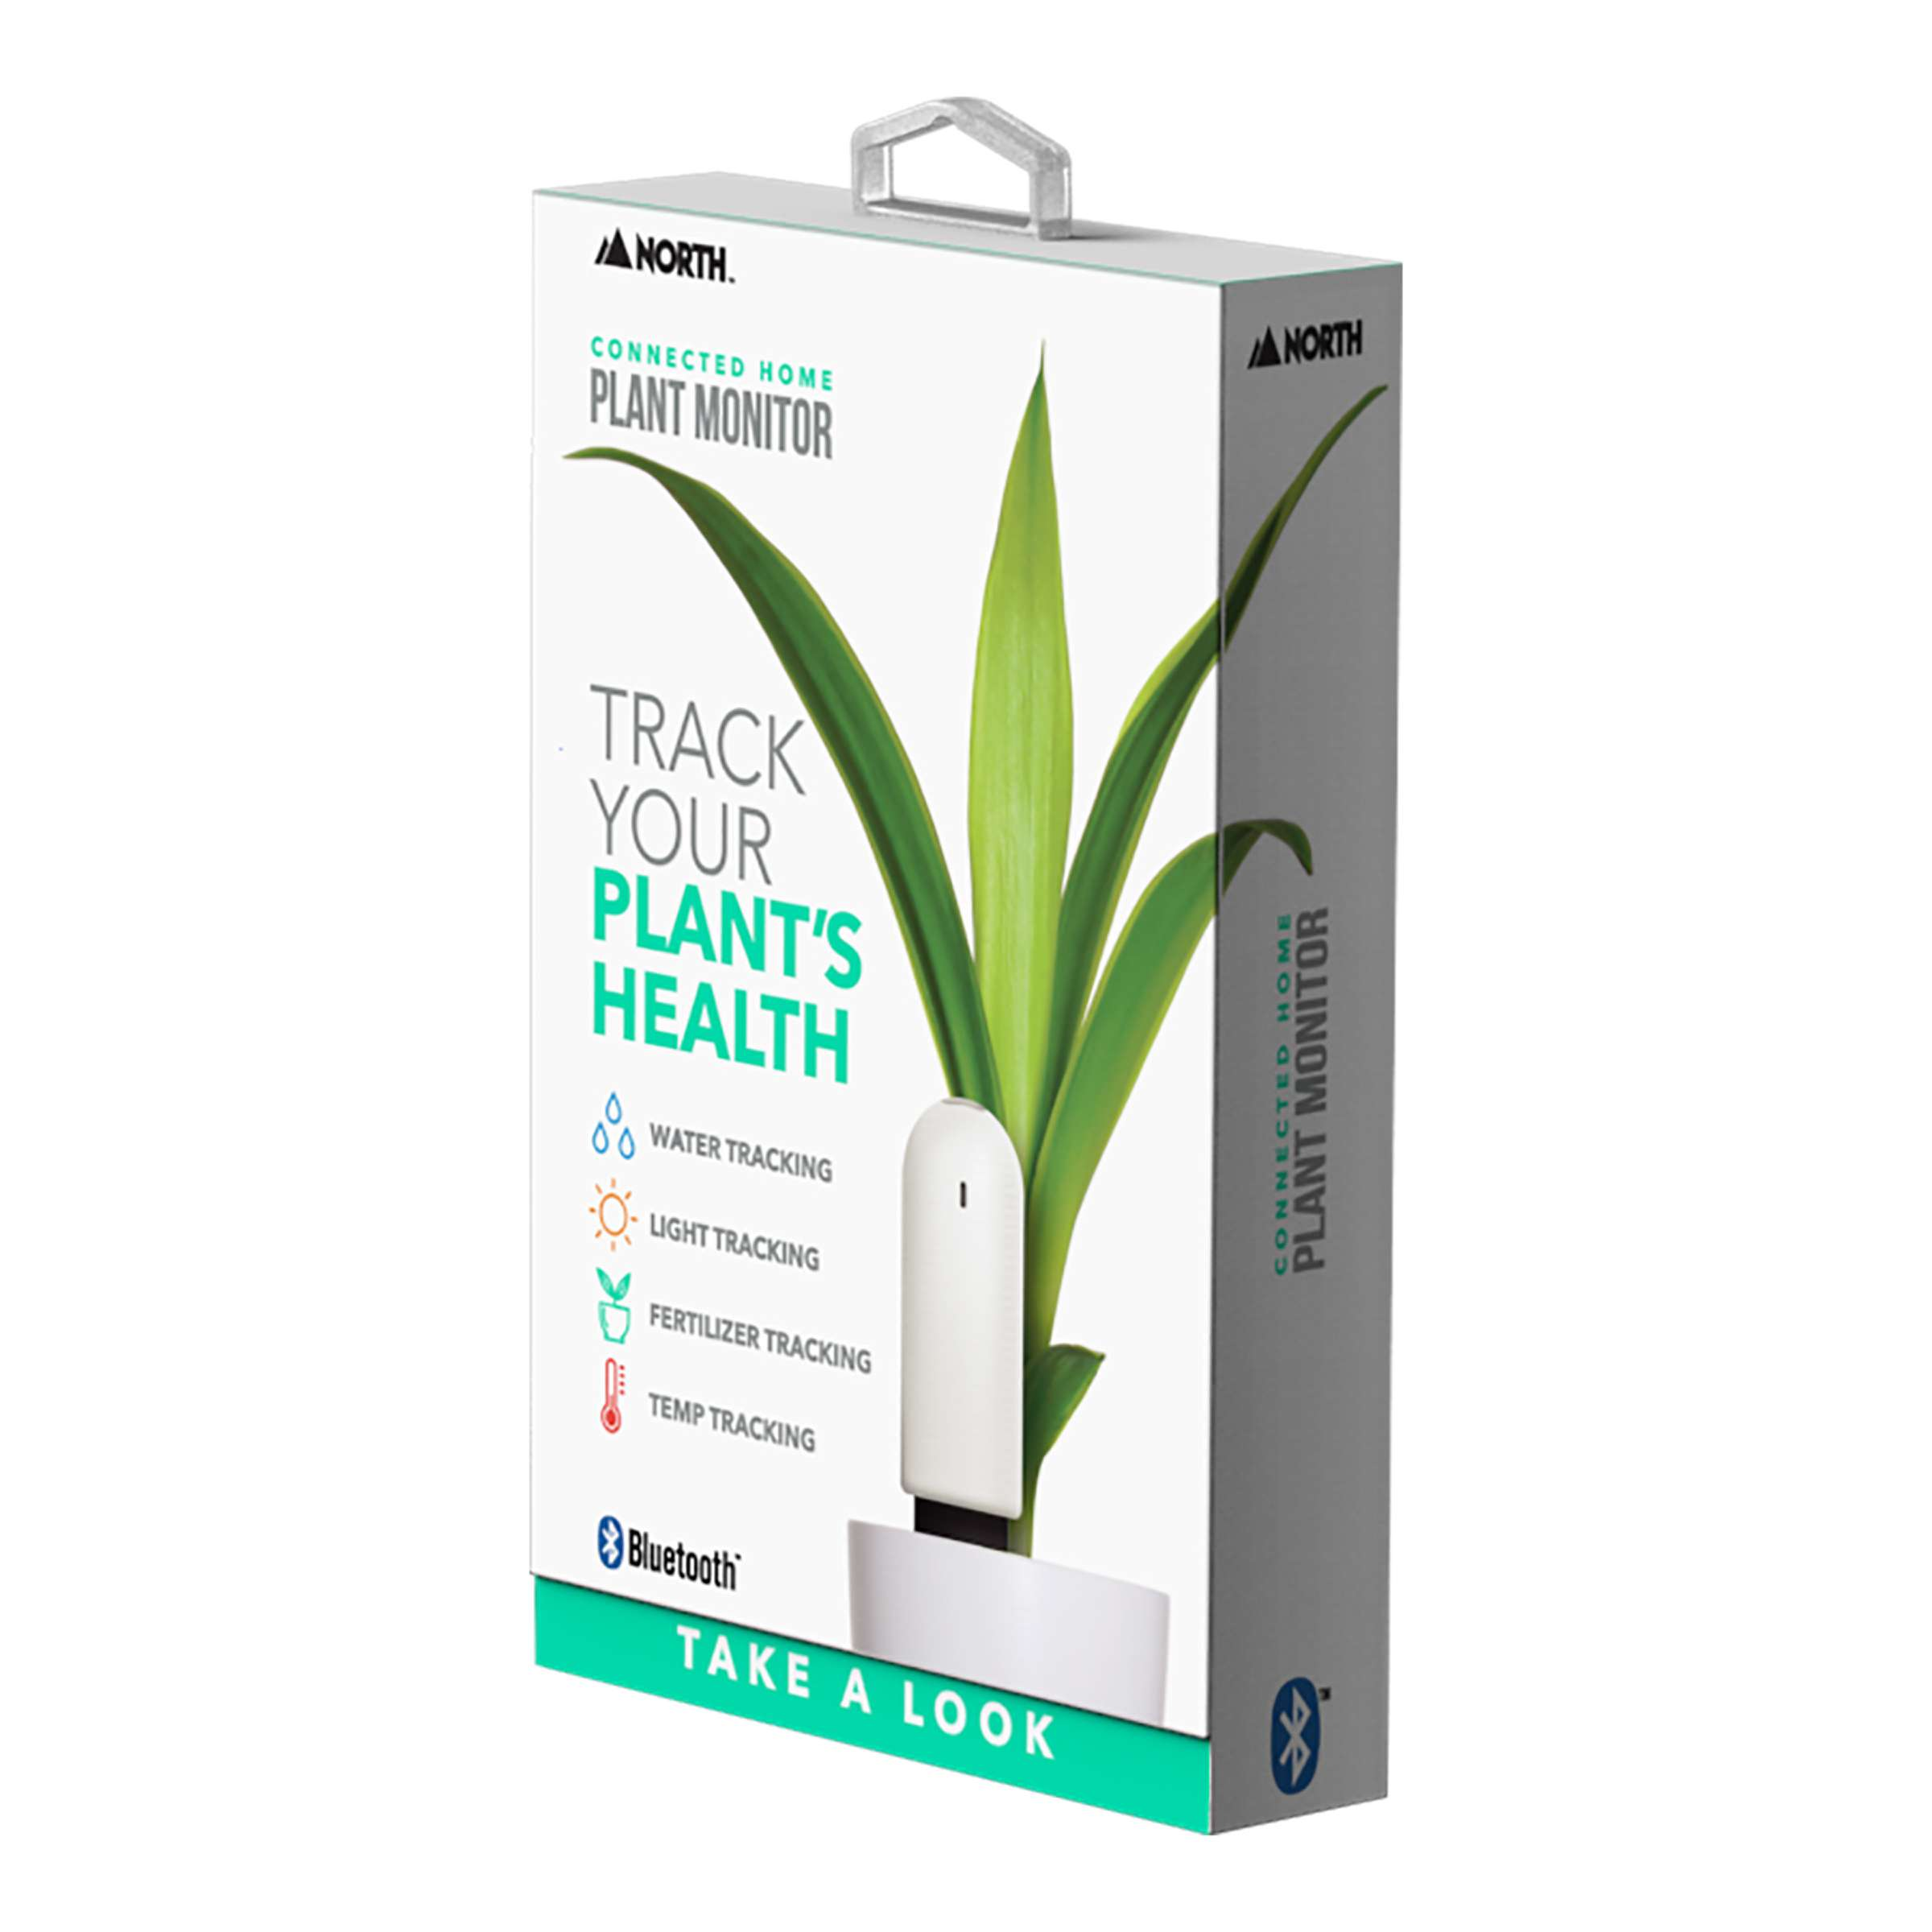 North Smart Plant Tracker